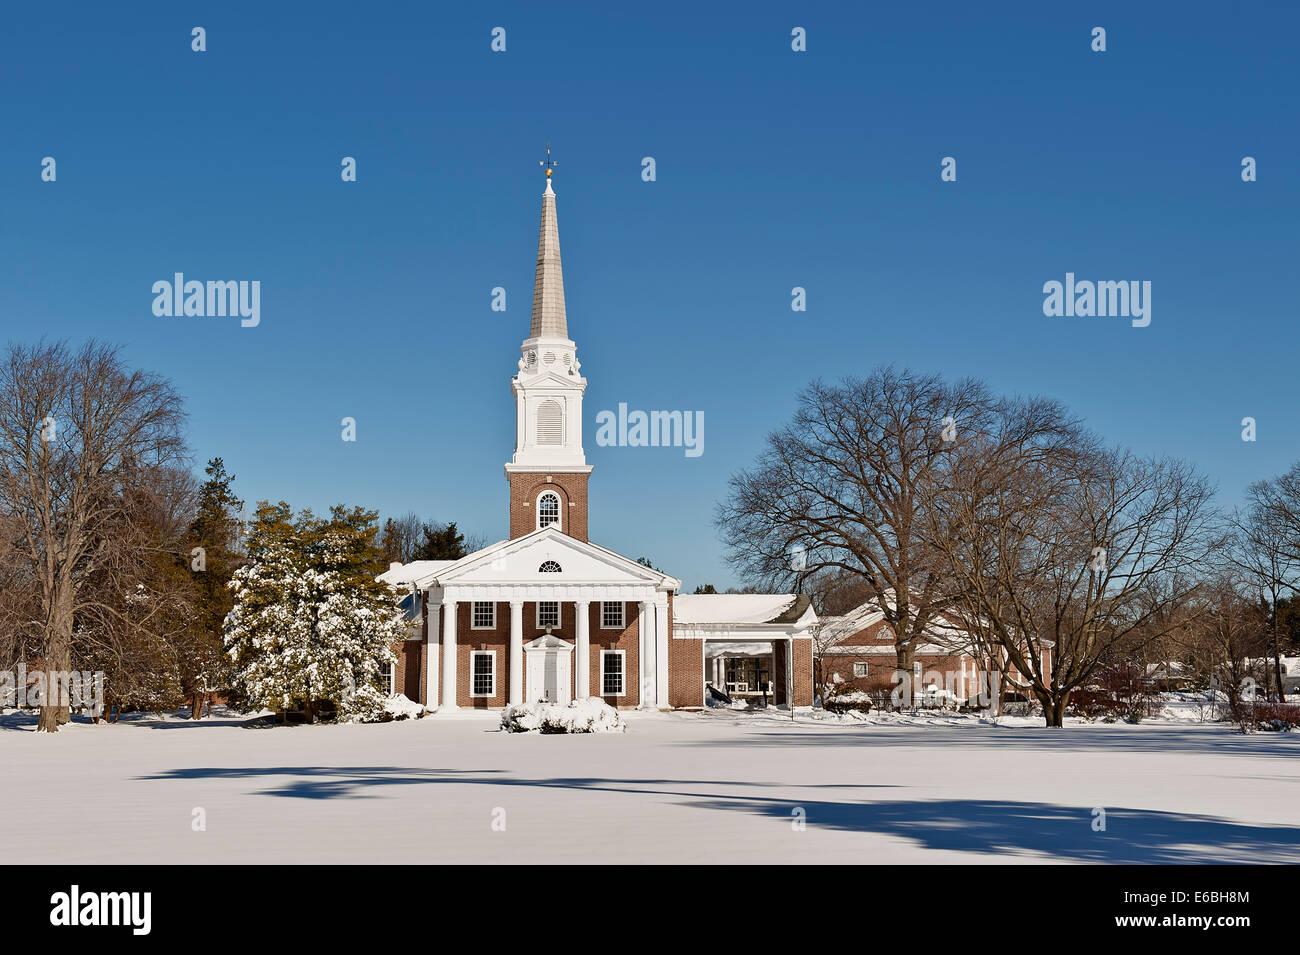 Church Snow Usa Stock Photos & Church Snow Usa Stock Images